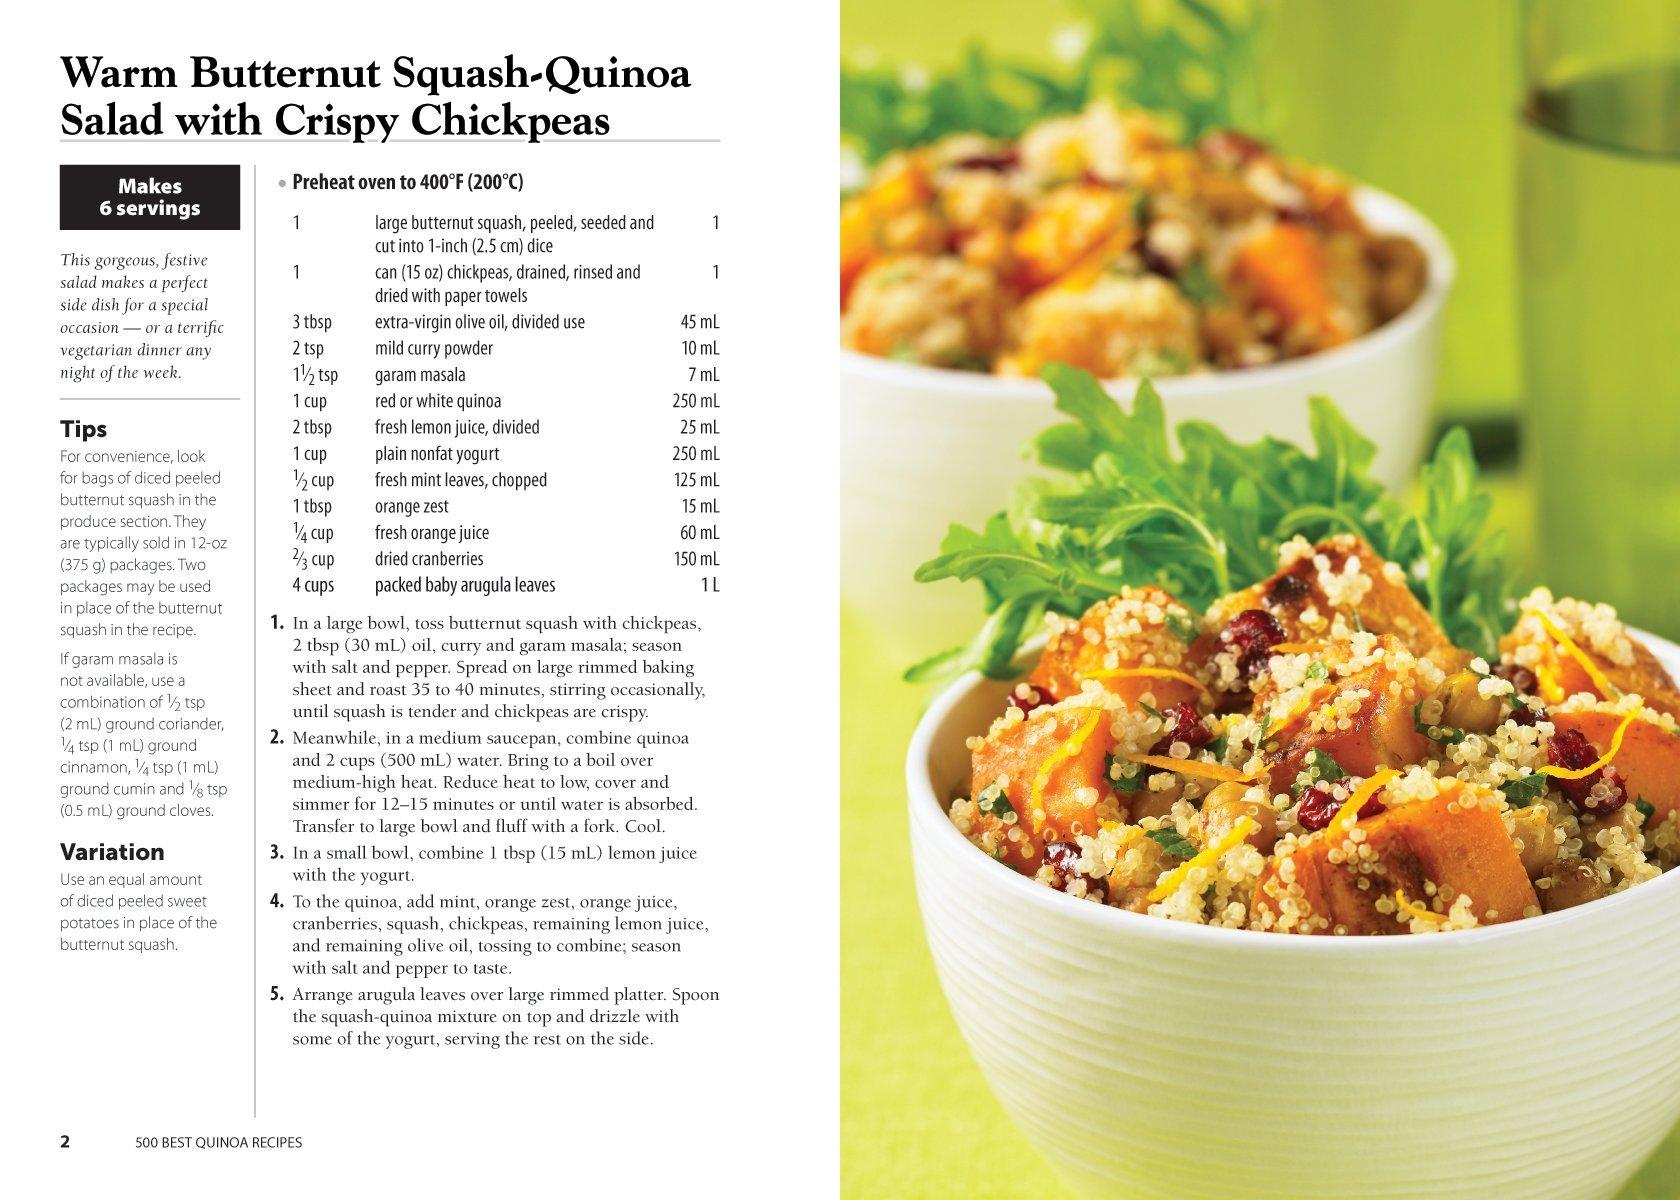 500 best quinoa recipes 100 gluten free super easy superfood 500 best quinoa recipes 100 gluten free super easy superfood camilla saulsbury 9780778804147 amazon books forumfinder Image collections